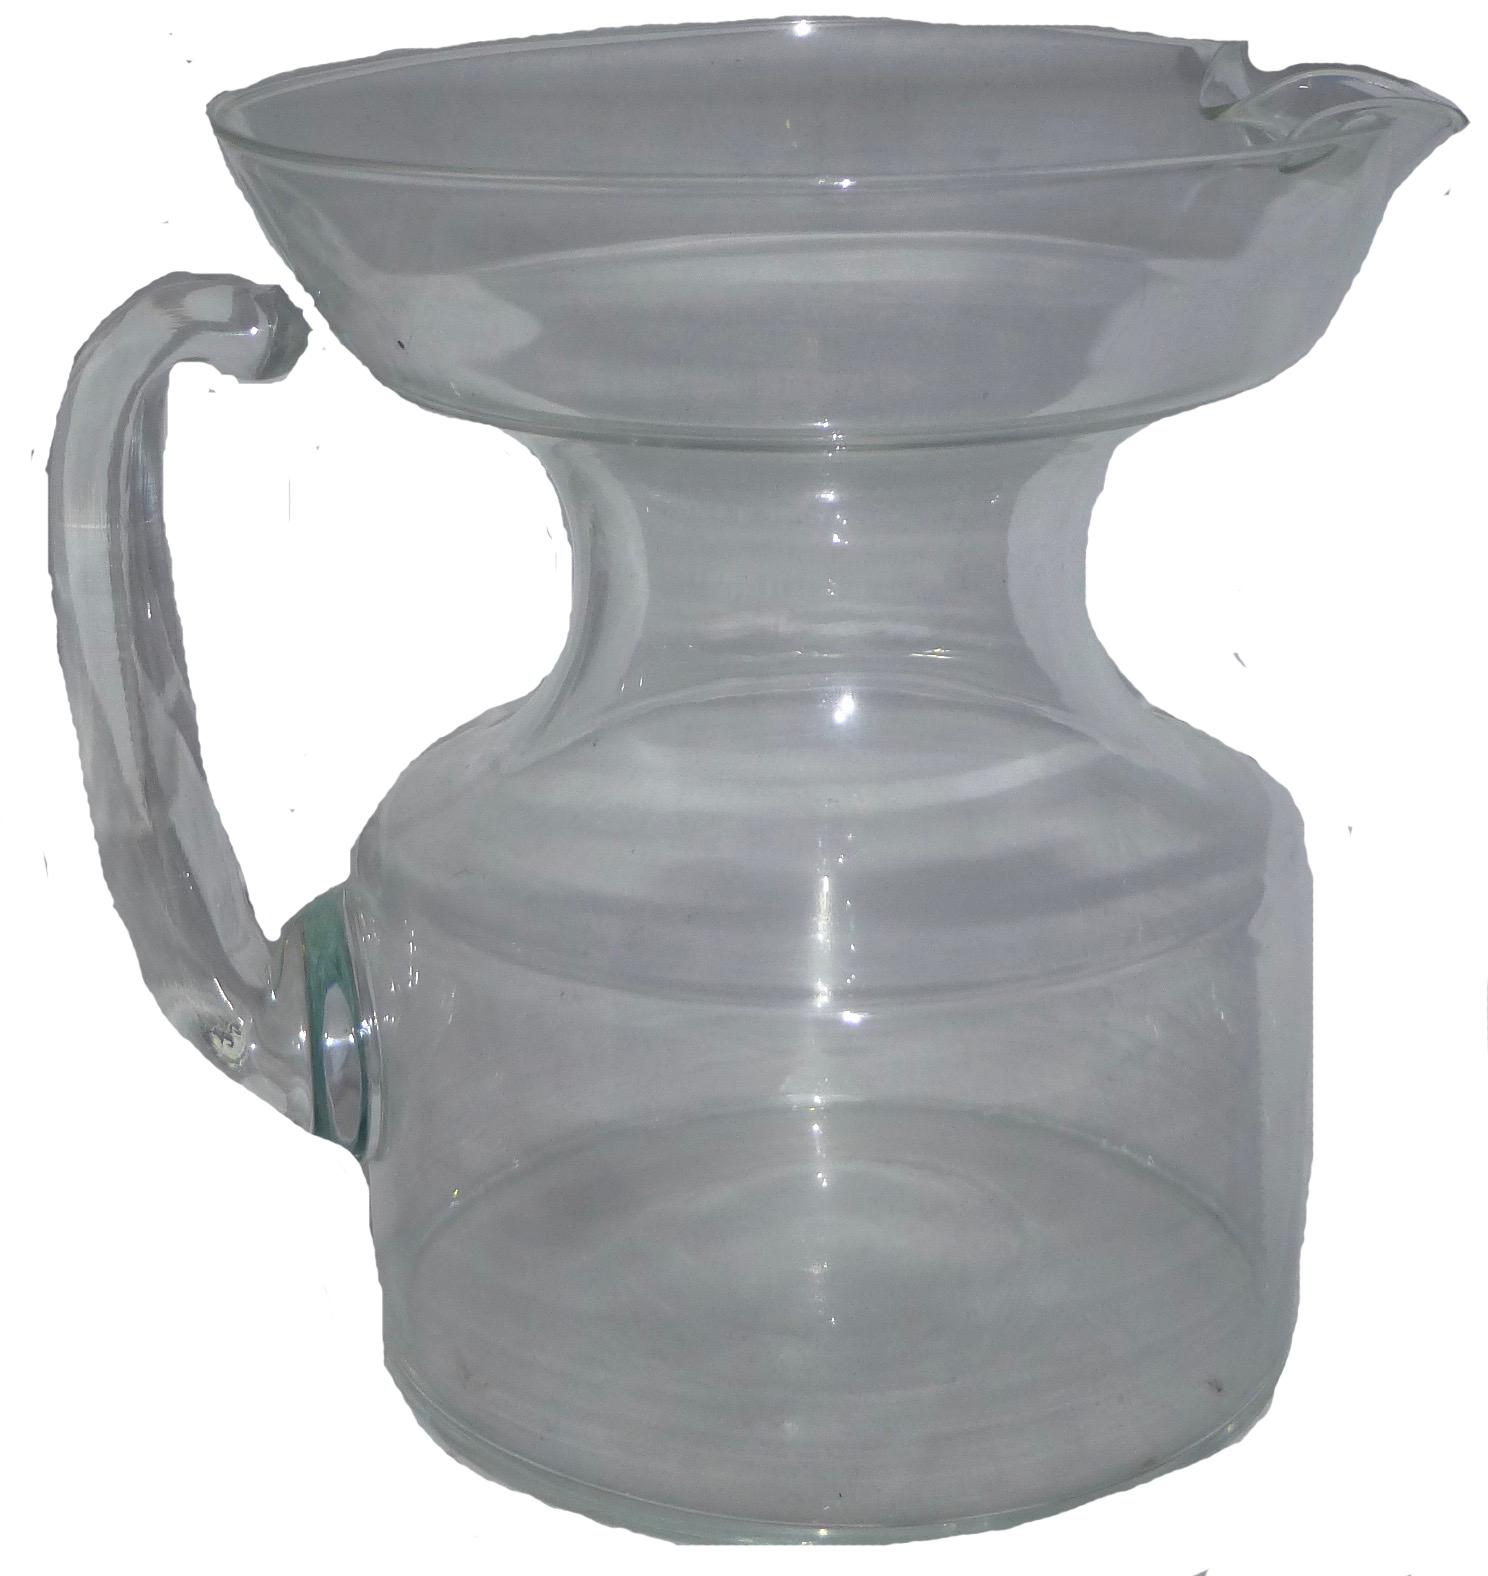 mid century modern glass pitcher  chairish - image of mid century modern glass pitcher